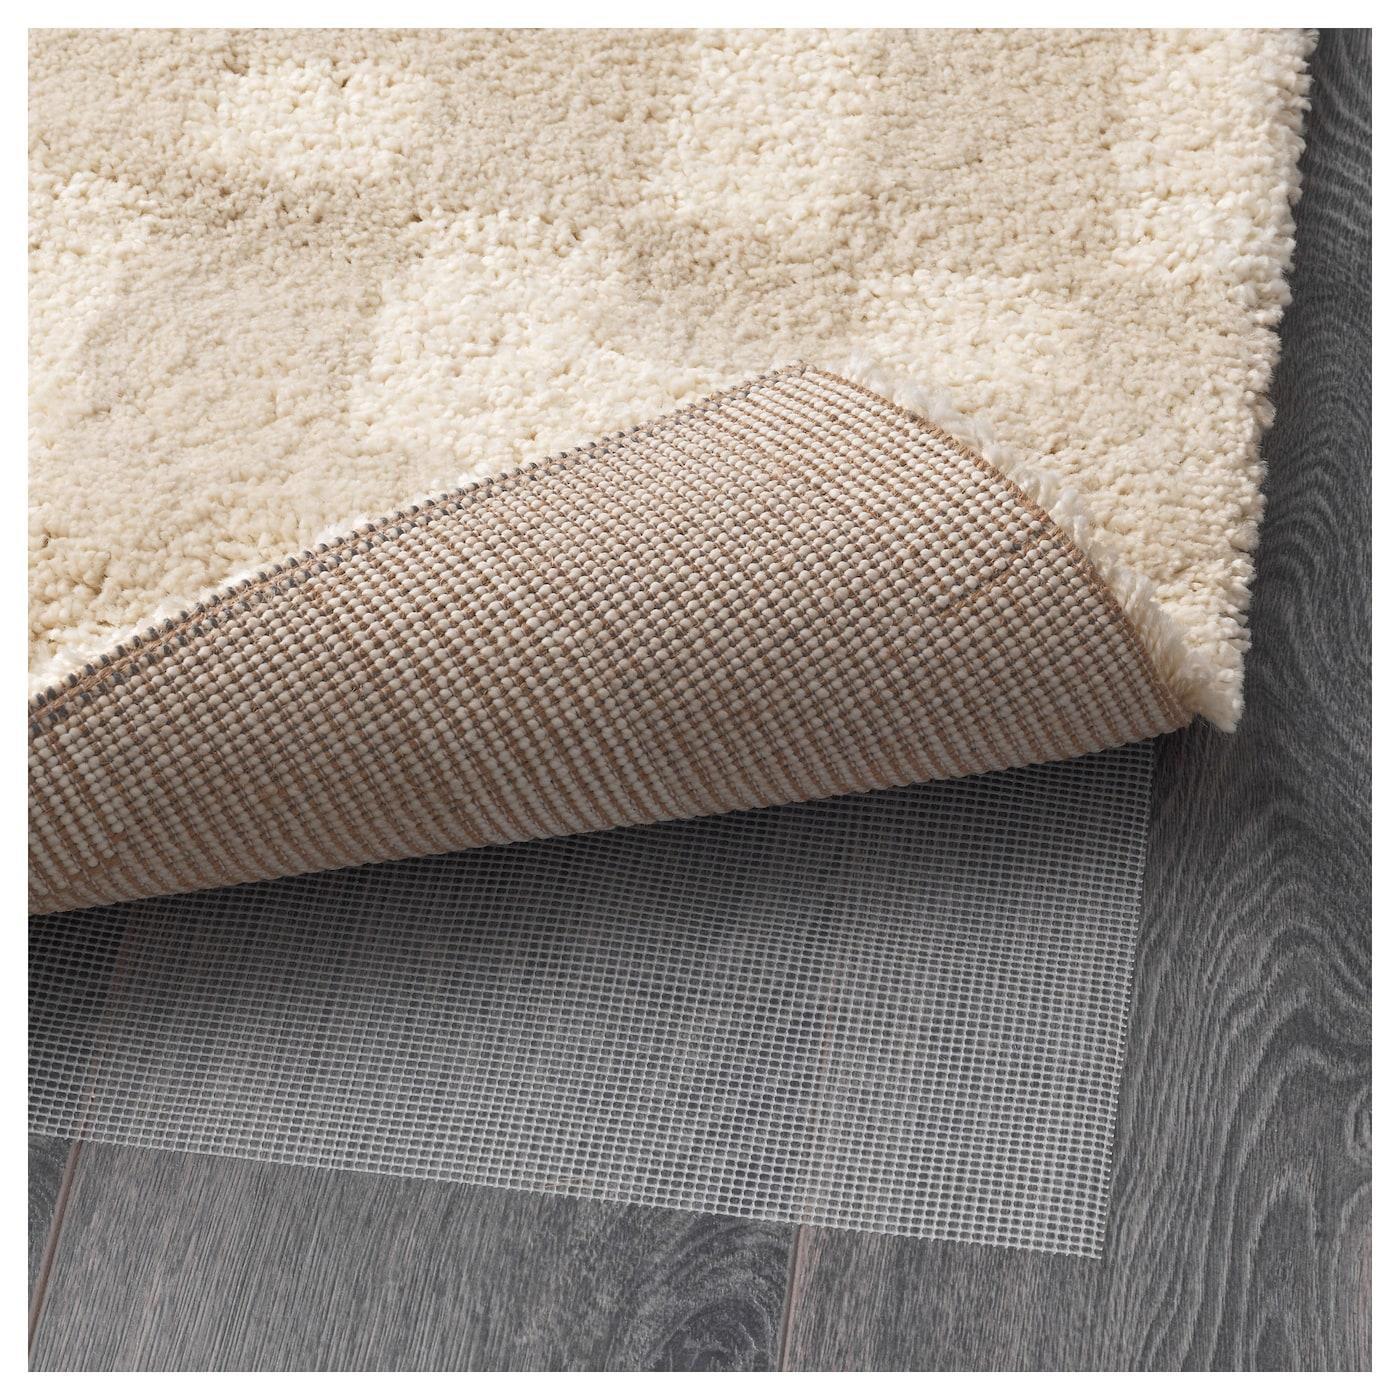 fakse tapis poils hauts blanc cass 200x250 cm ikea. Black Bedroom Furniture Sets. Home Design Ideas